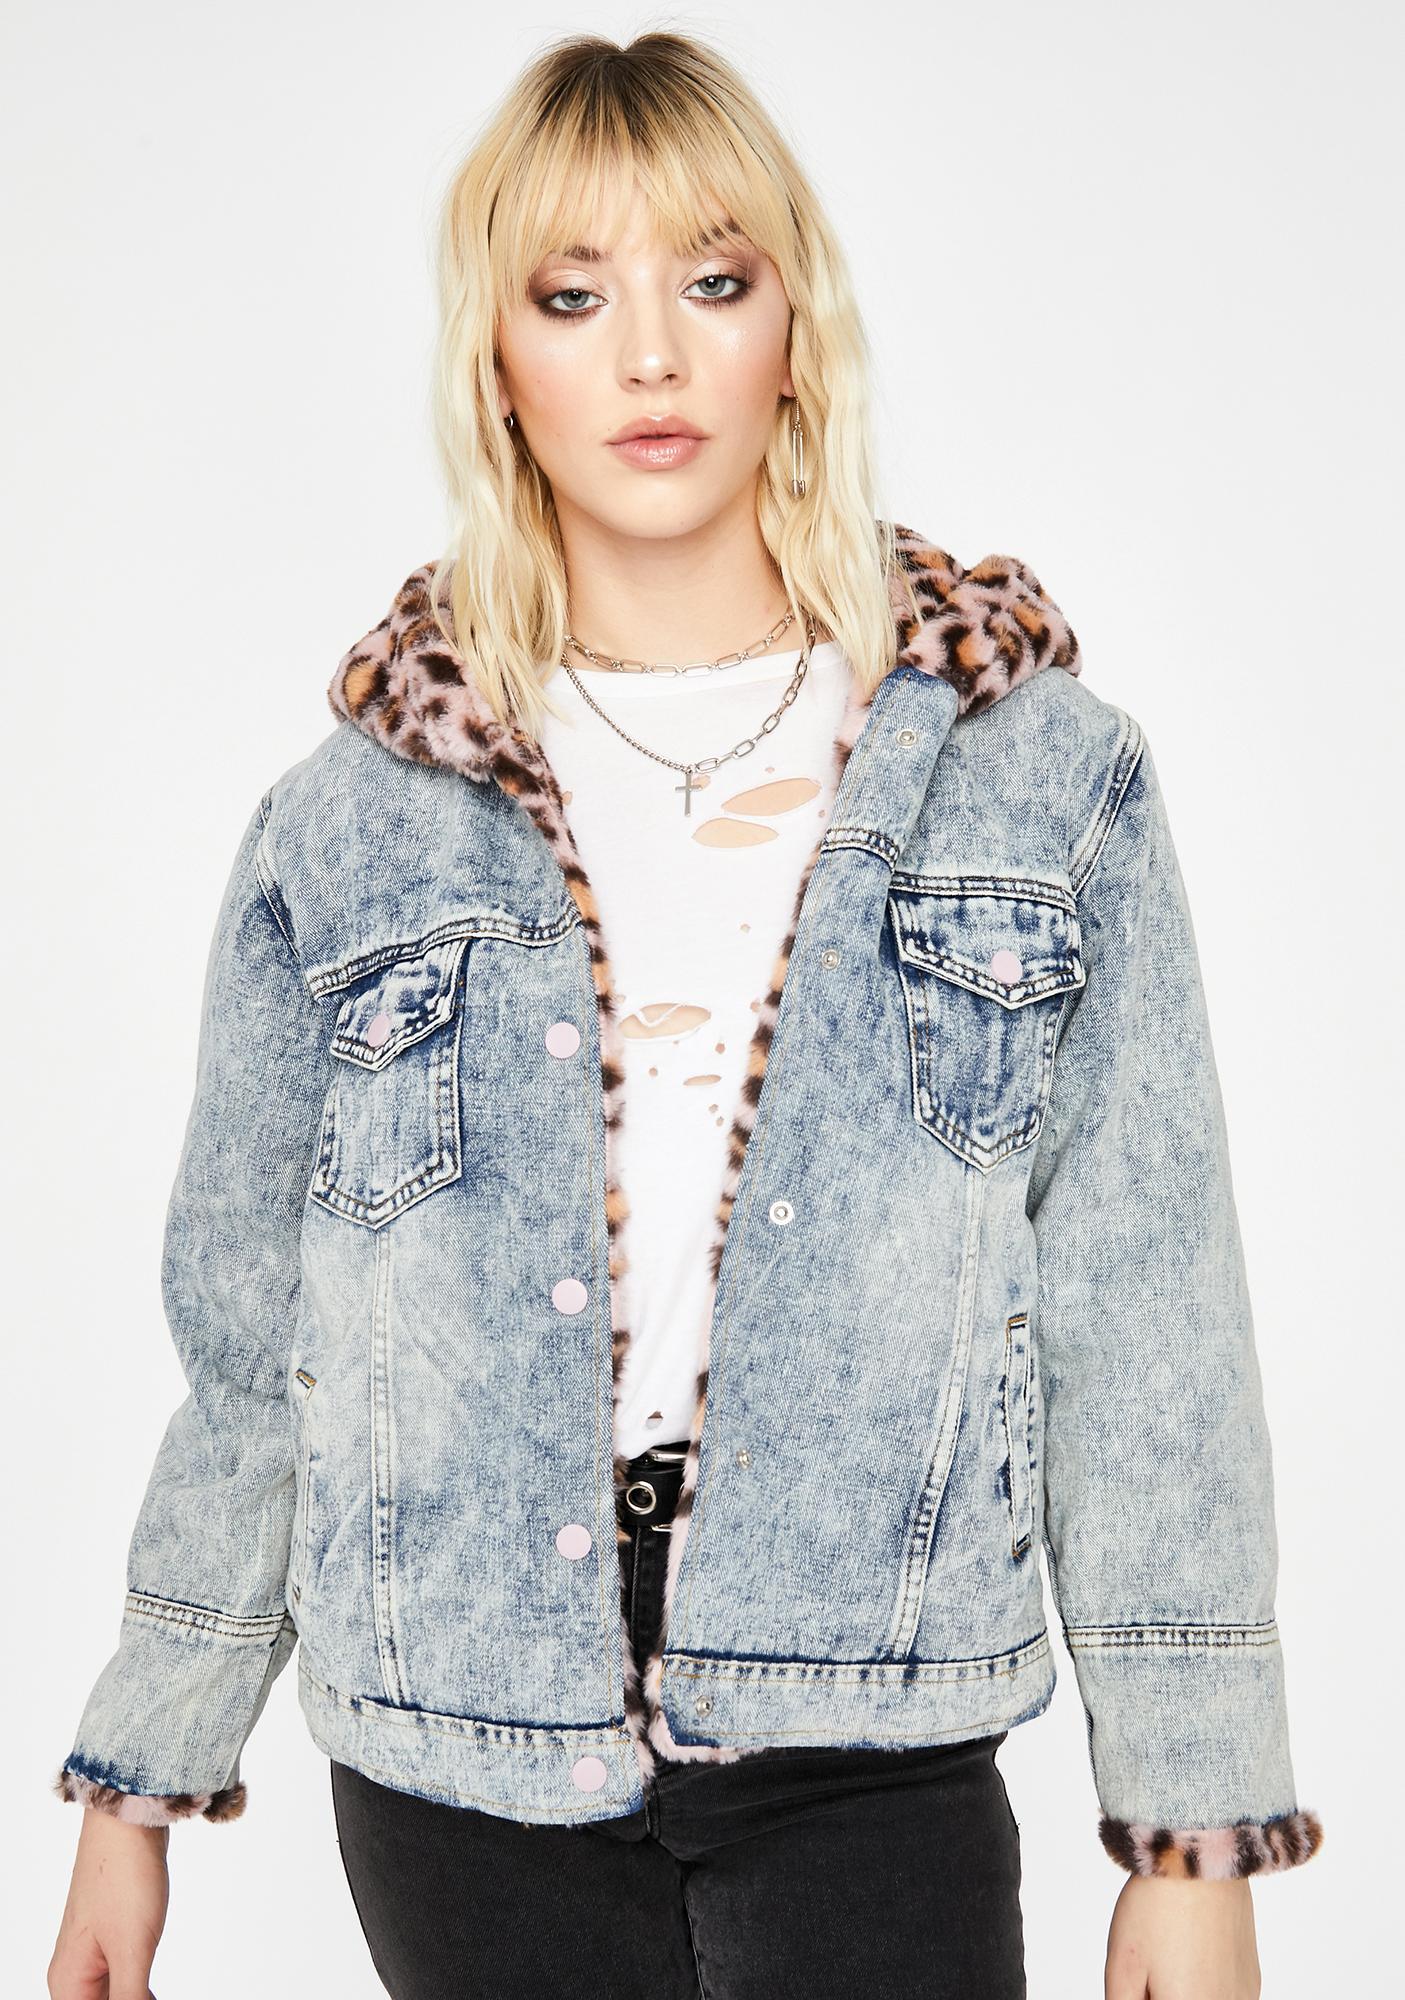 Baby Miss Fierce Denim Jacket